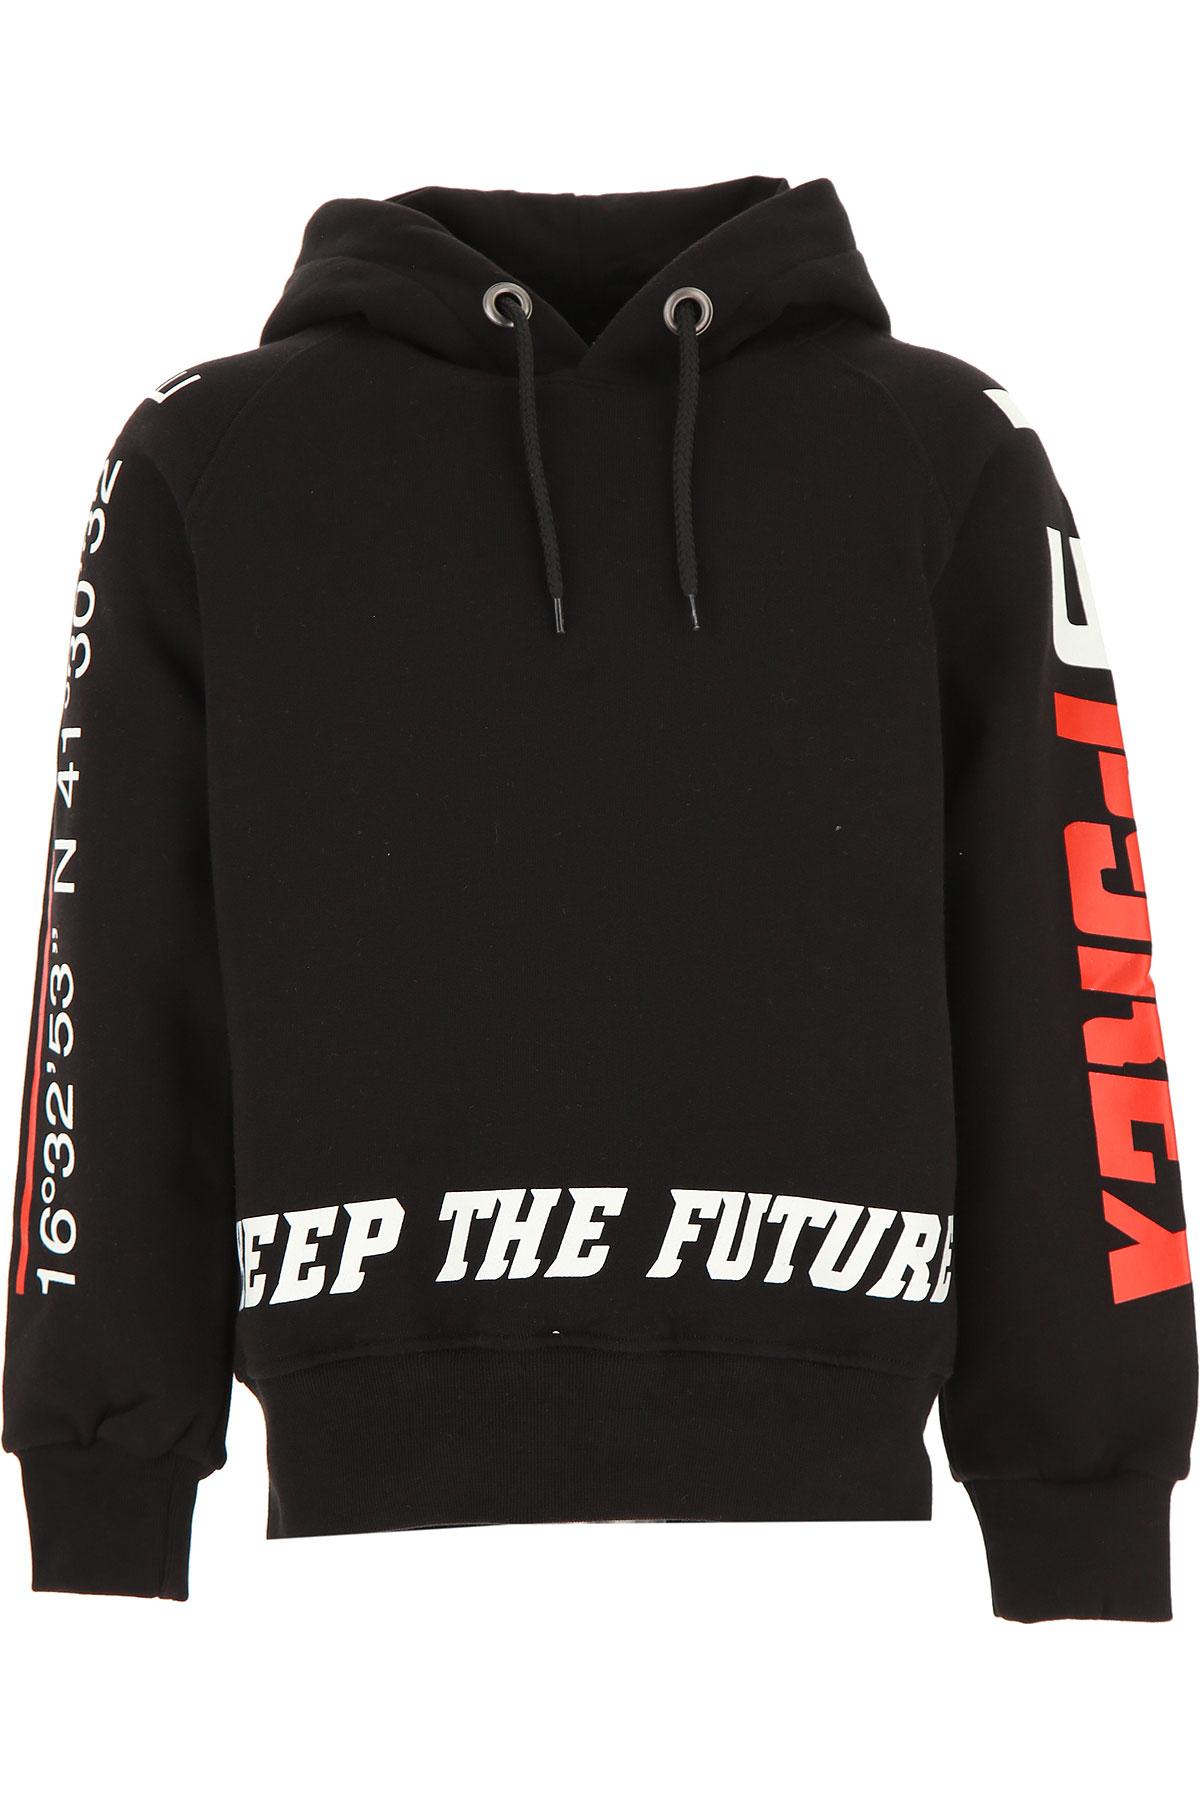 Pyrex Kids Sweatshirts & Hoodies for Boys On Sale, Black, Cotton, 2019, S XS XXL (16 Y)